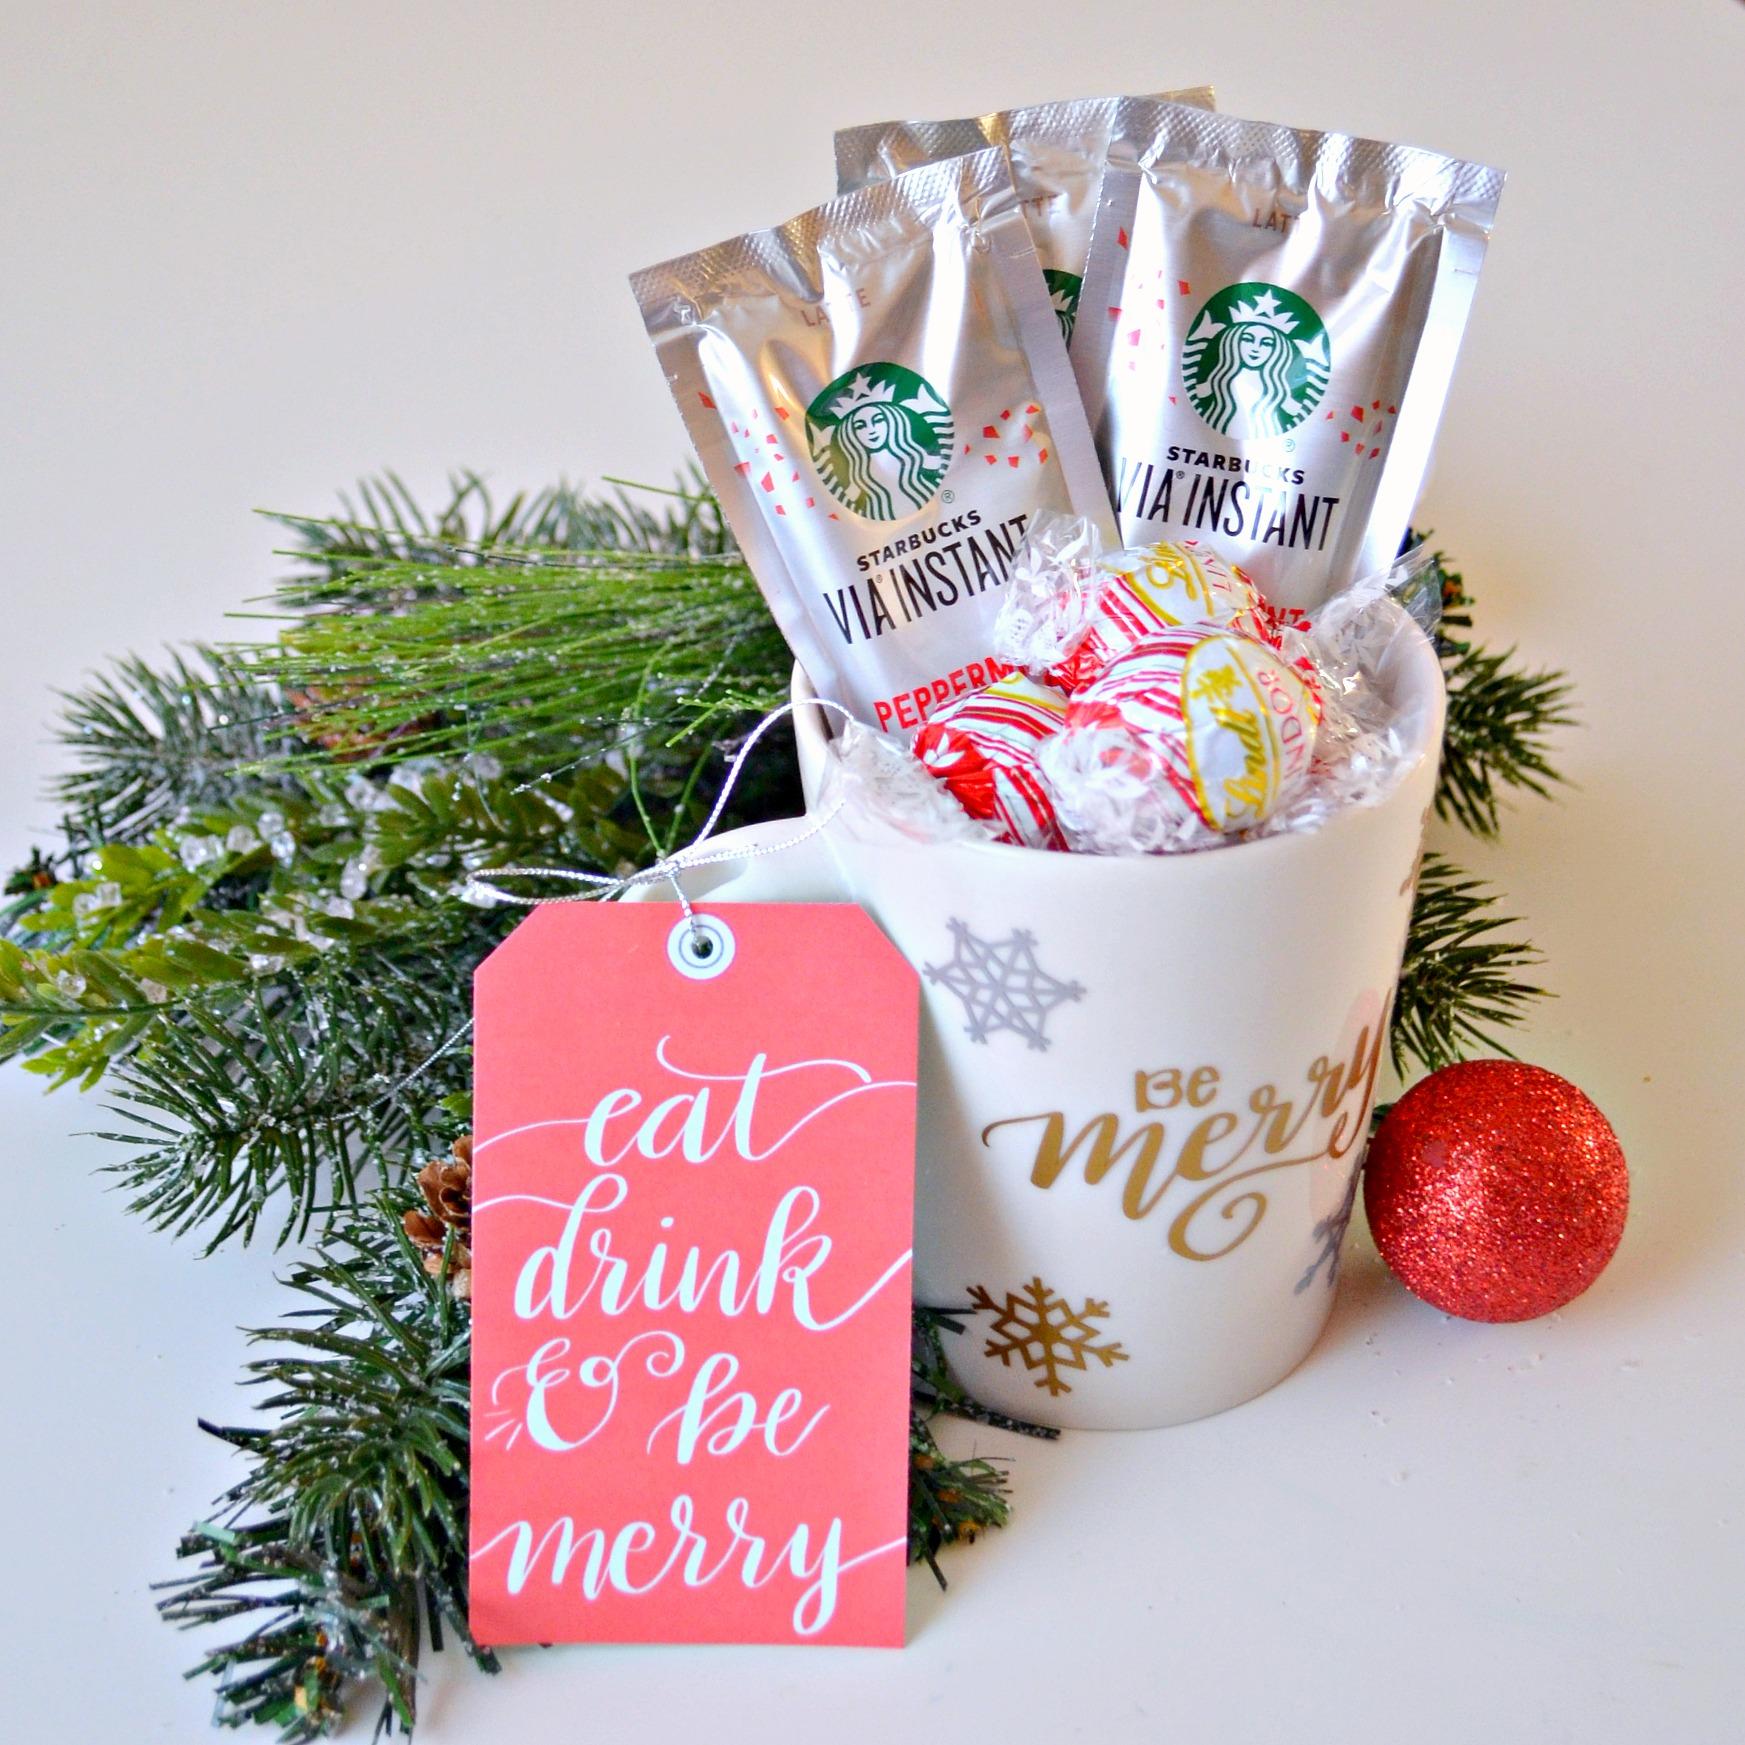 Starbucks & Lindt Gift Idea